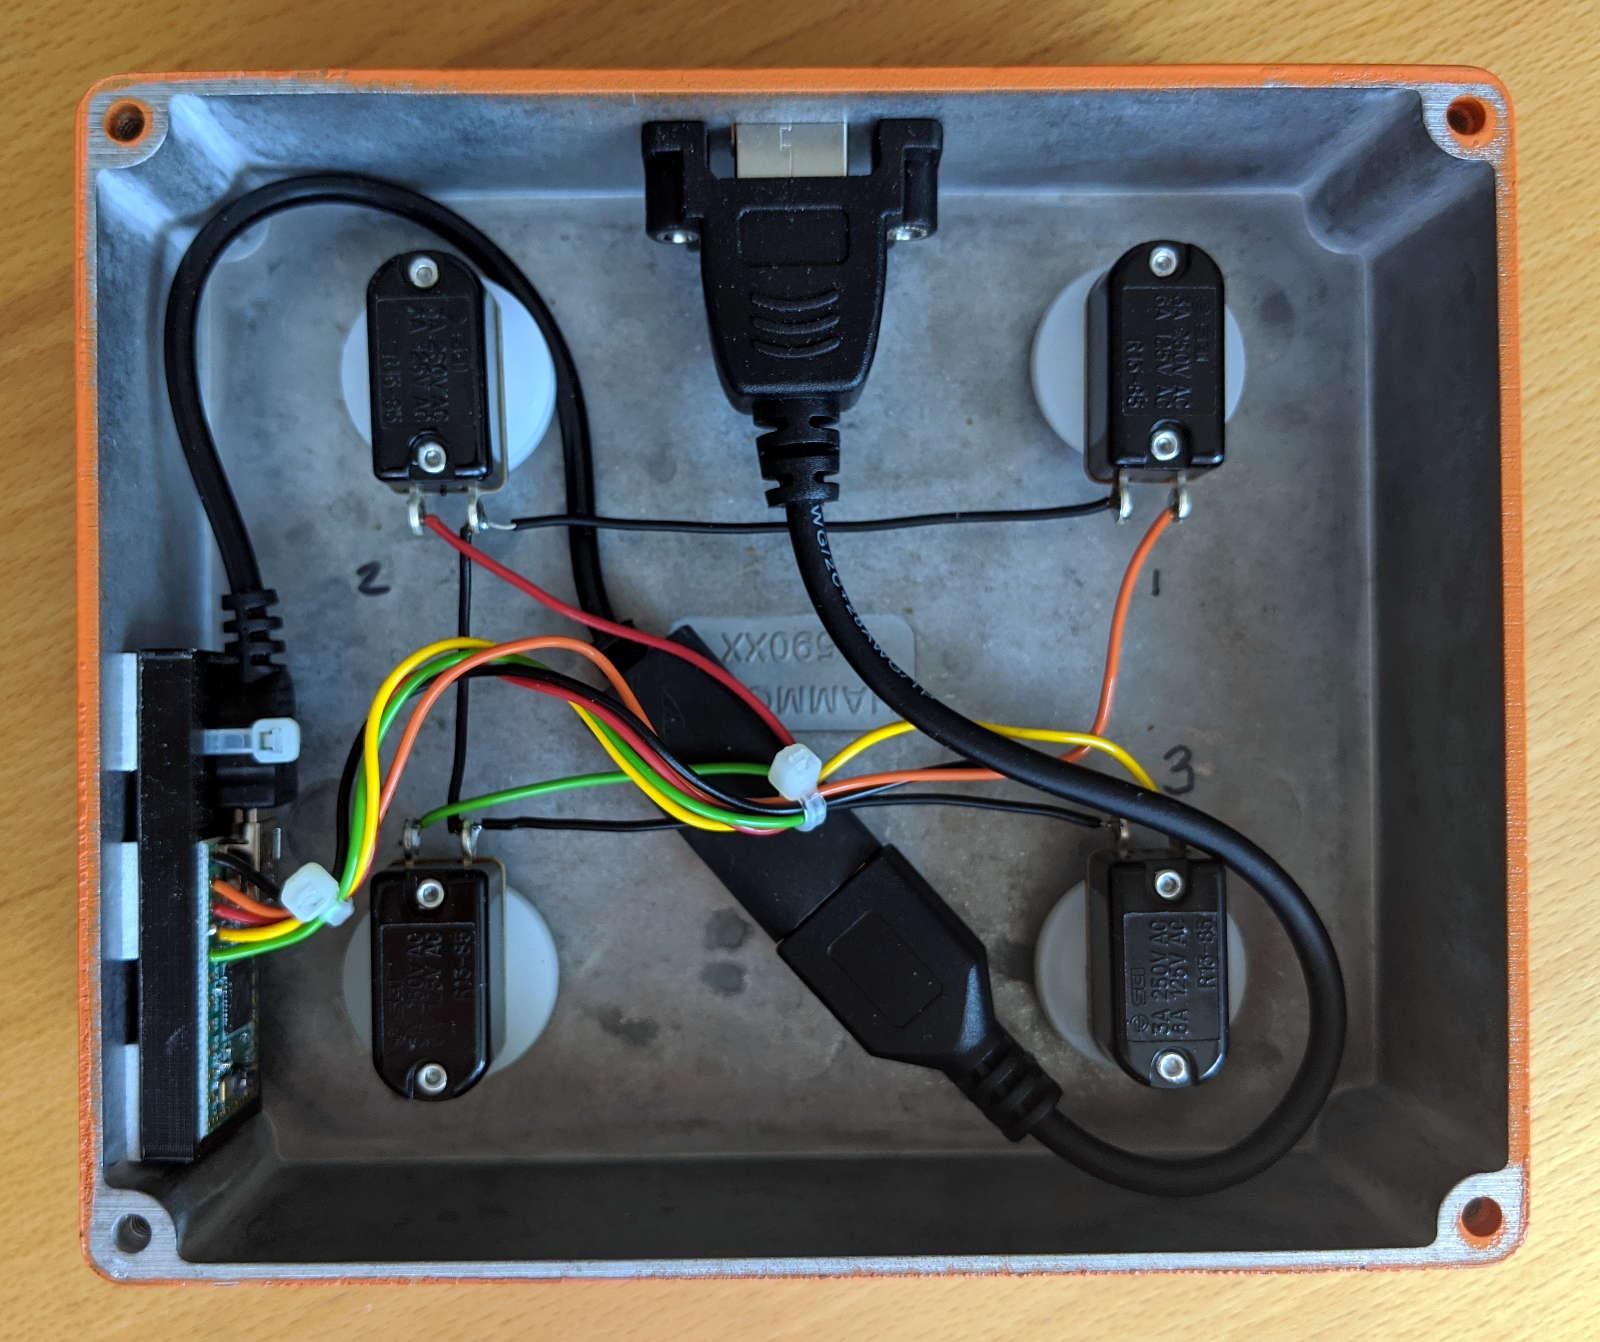 Wiring and internal arrangement